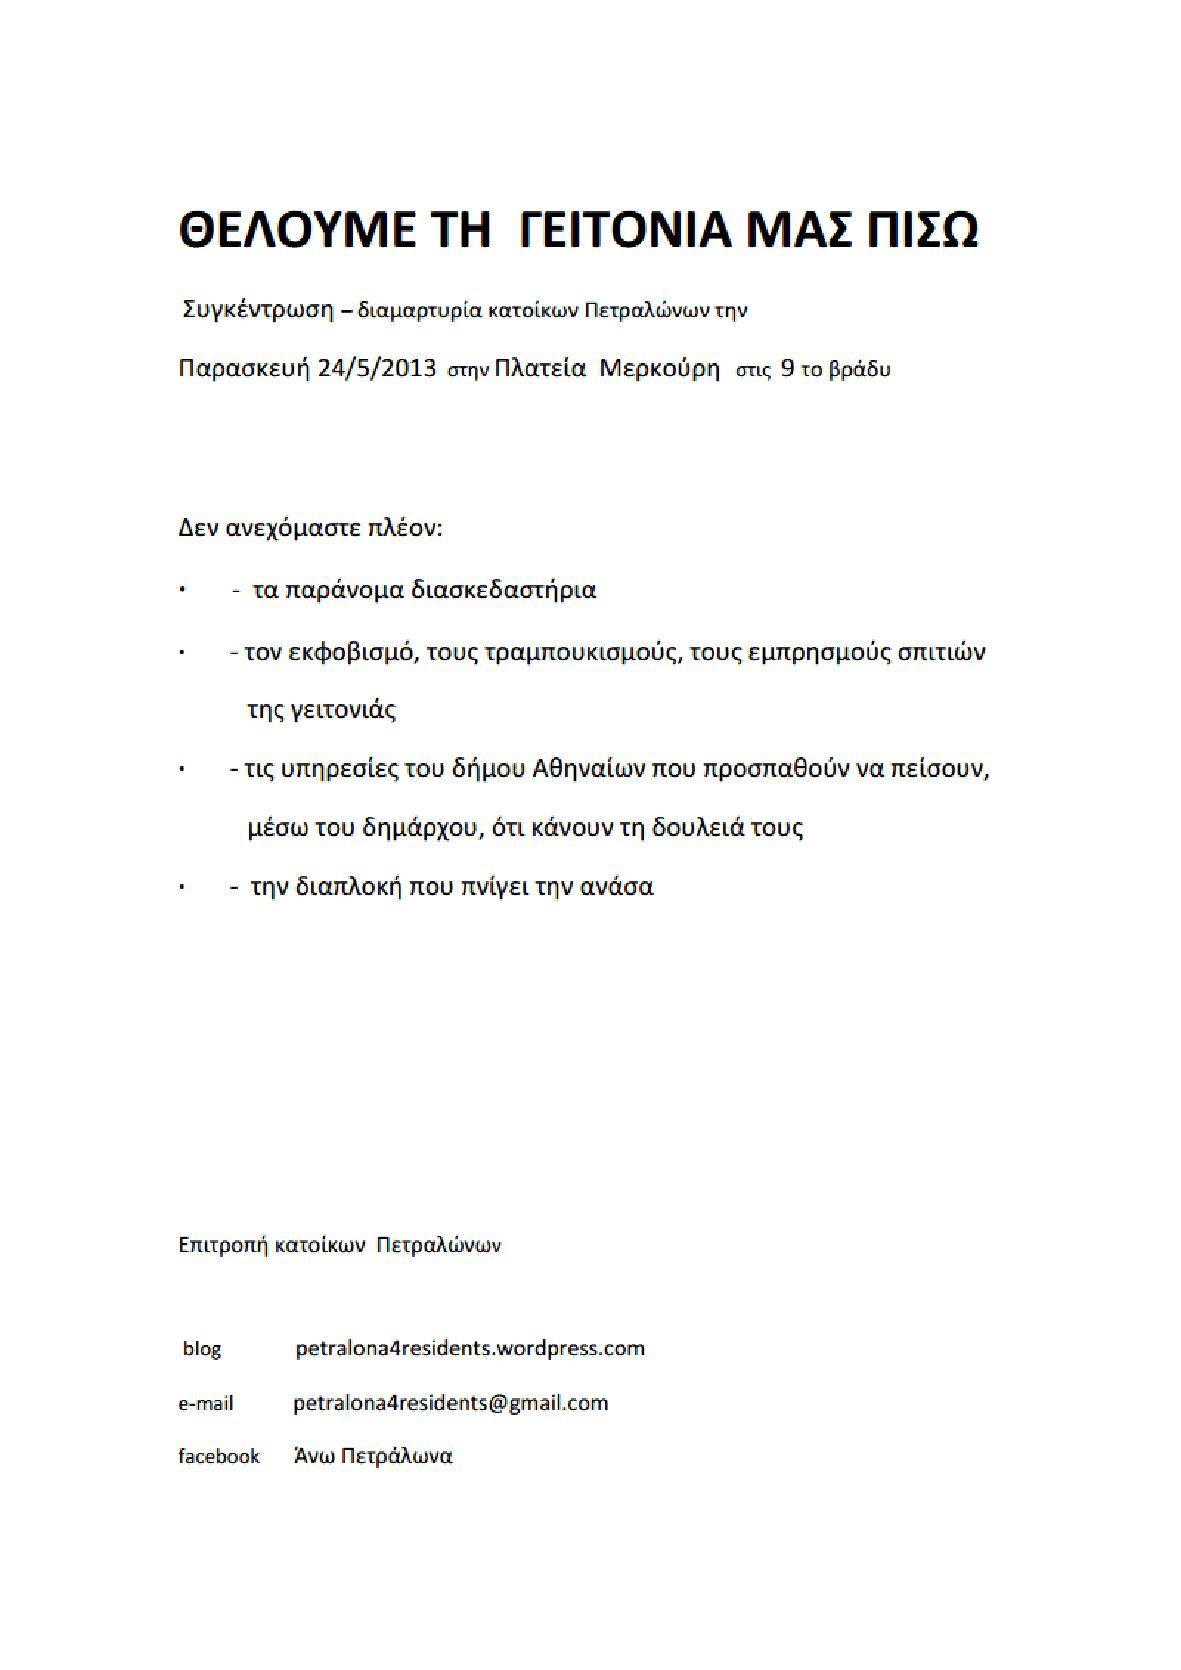 diadilosi-petralona-magazia24052013